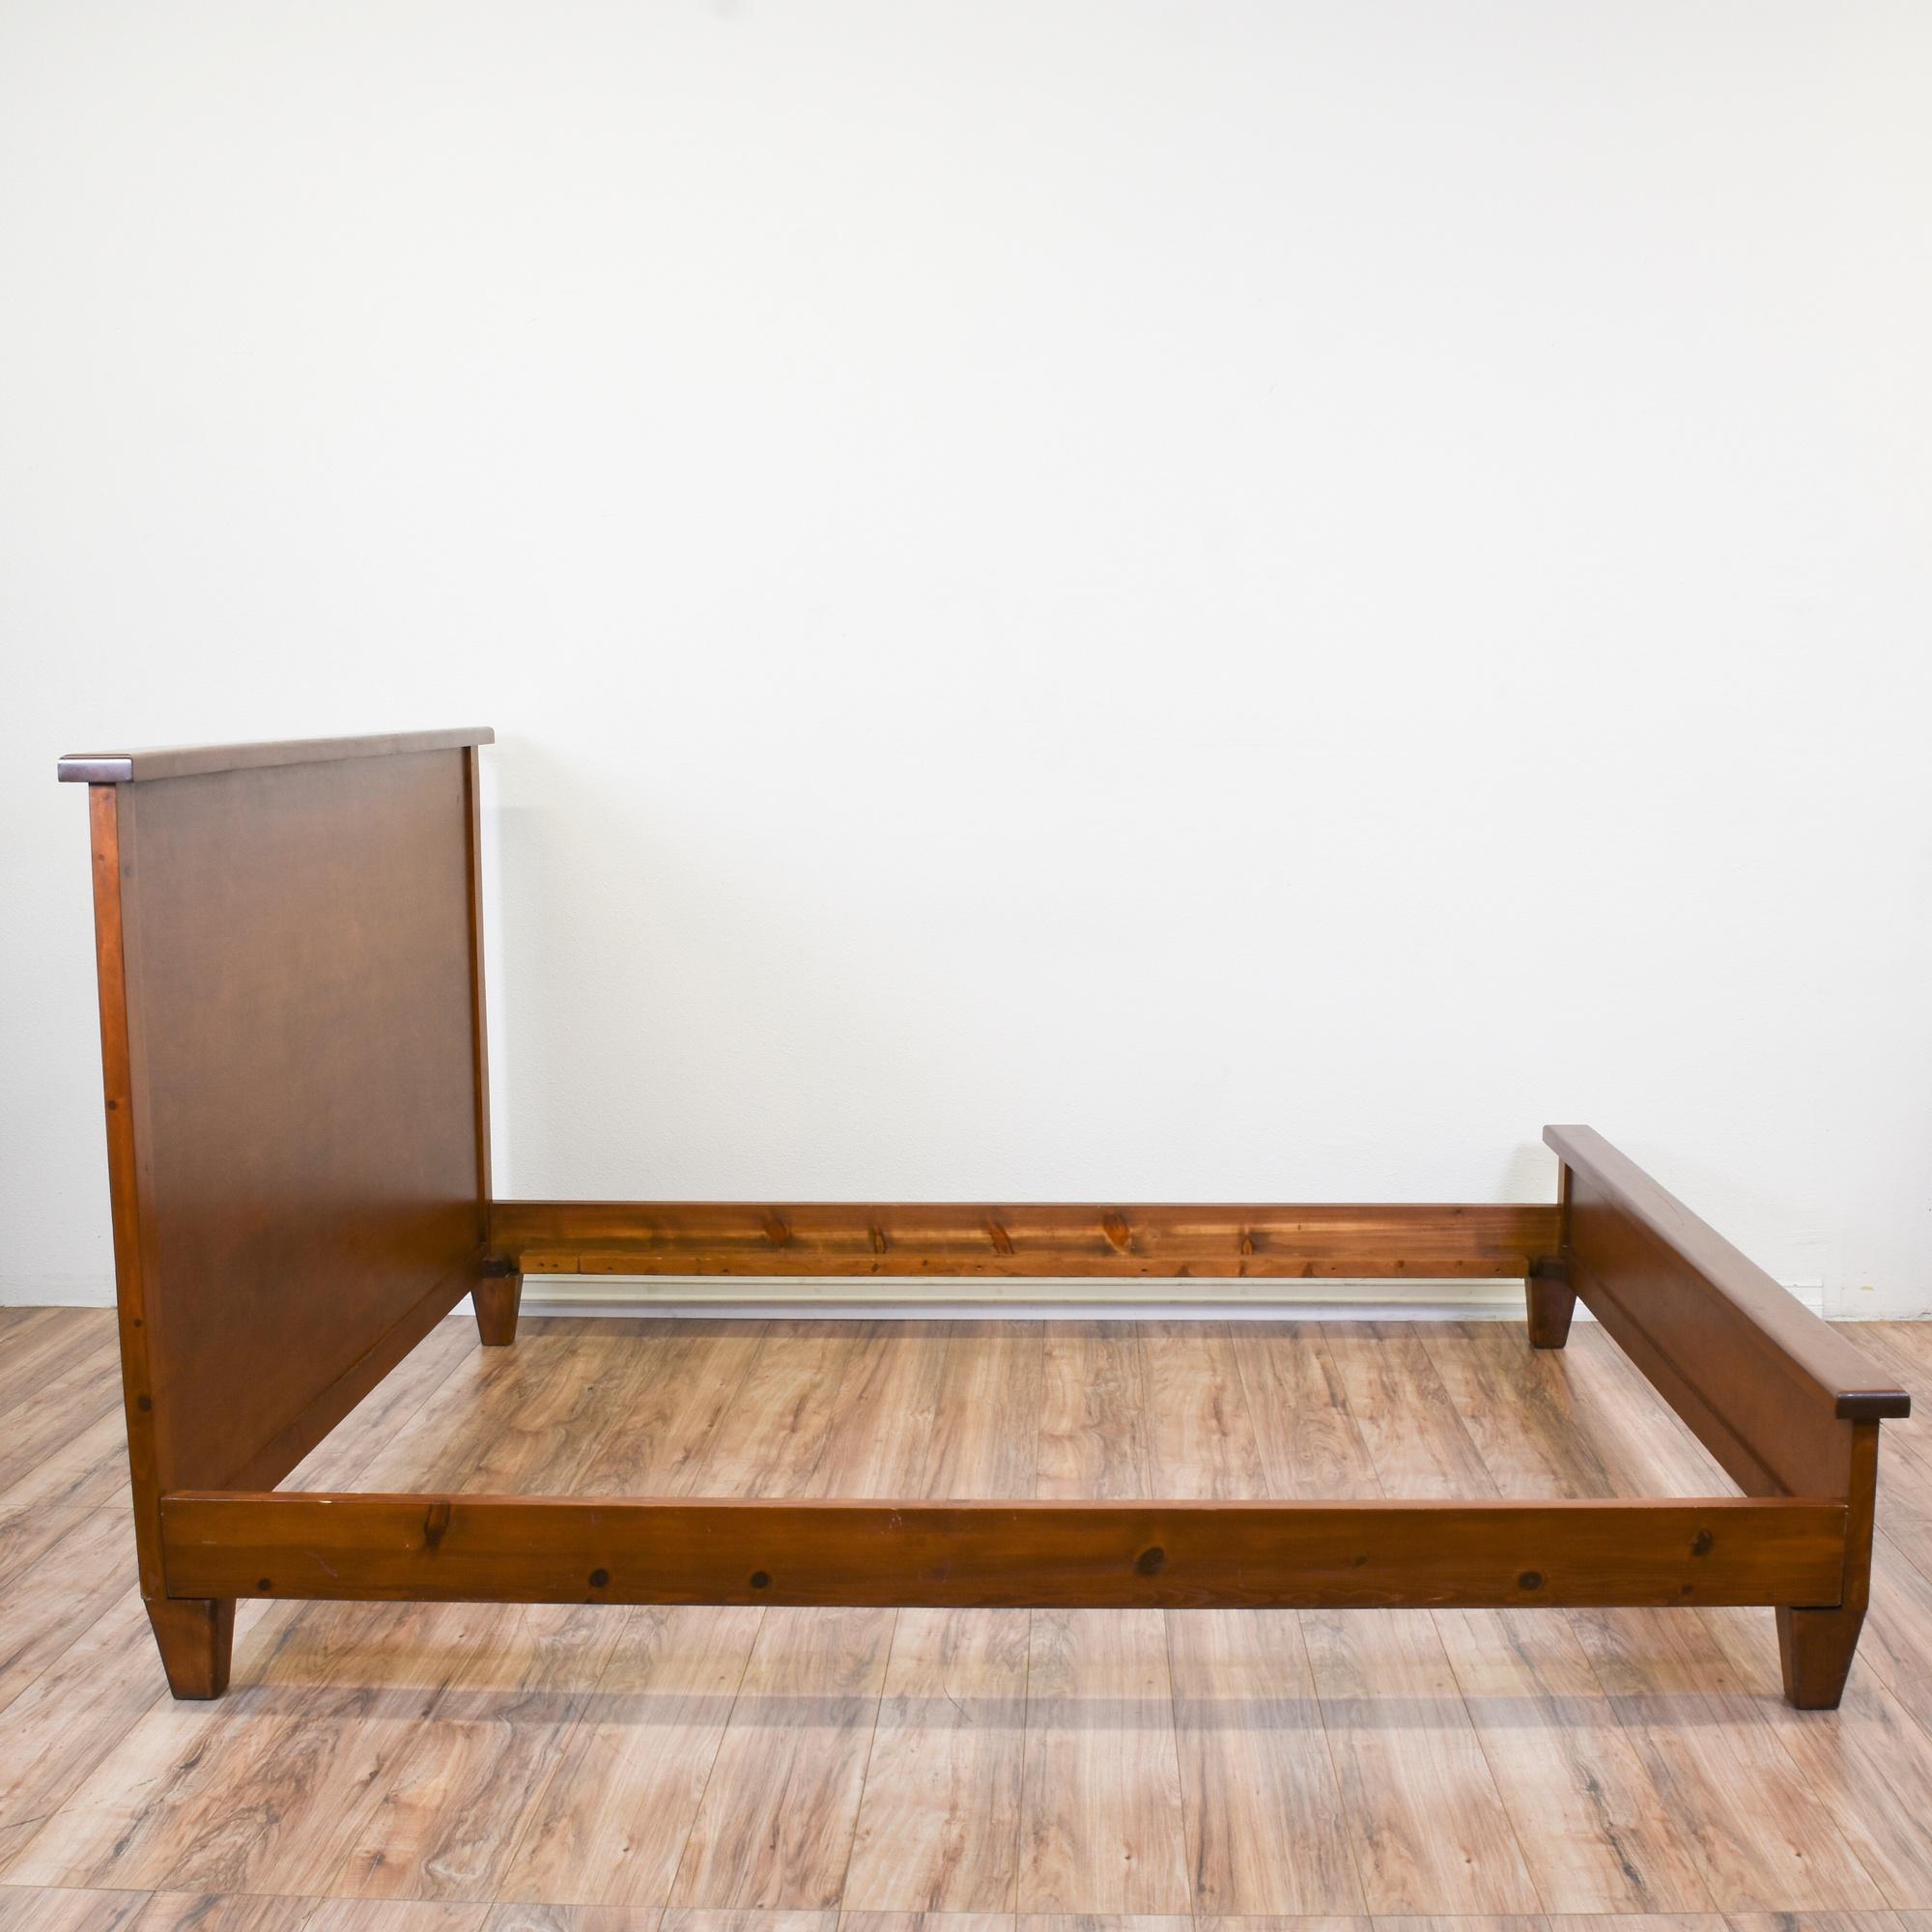 simple walnut cali king sized bed frame loveseat vintage